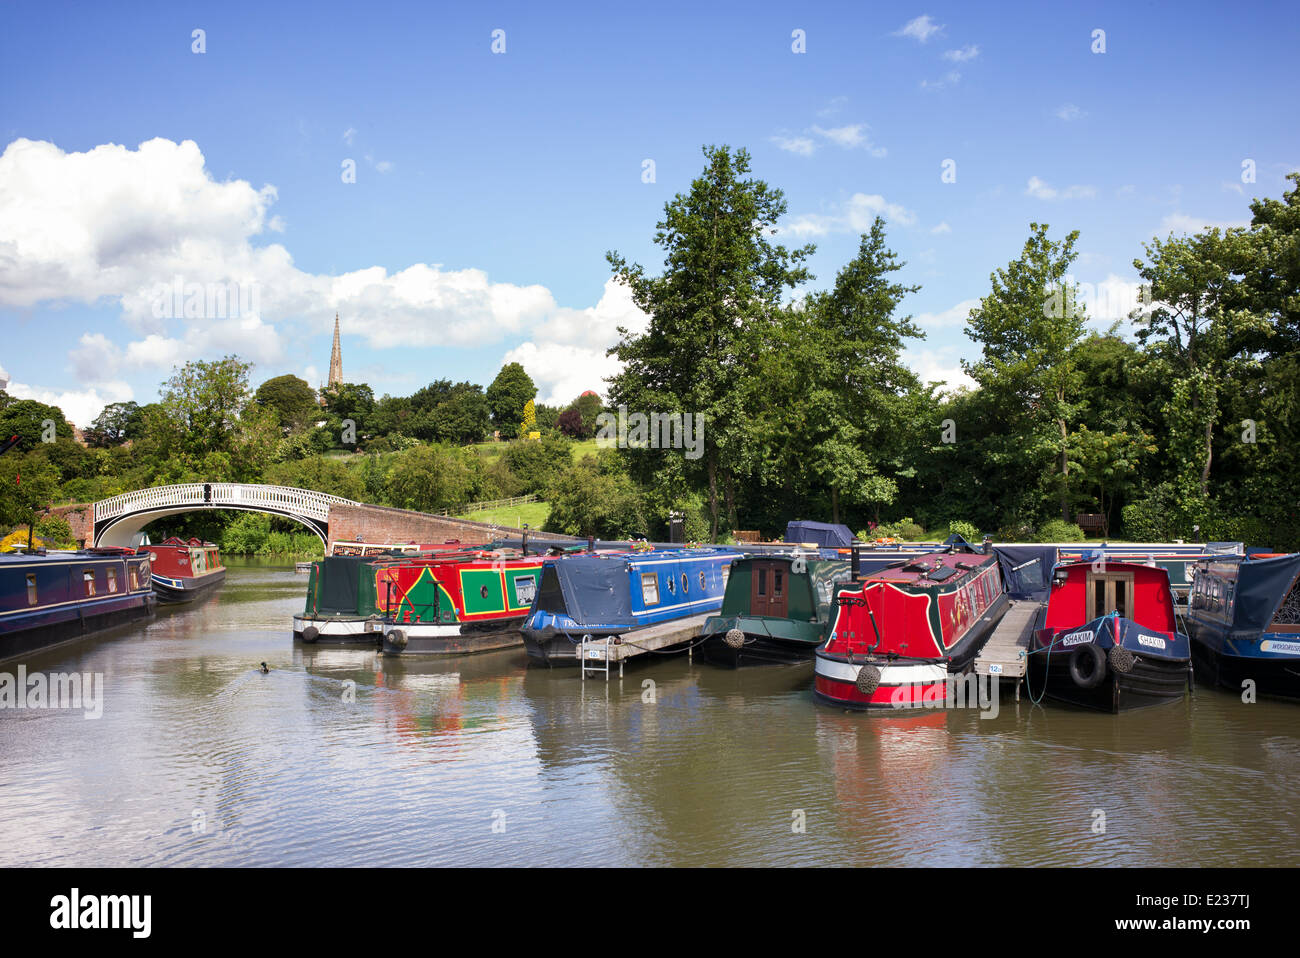 Narrowboats at Braunston Marina on the Grand Union canal. Braunston,  Northamptonshire, England - Stock Image